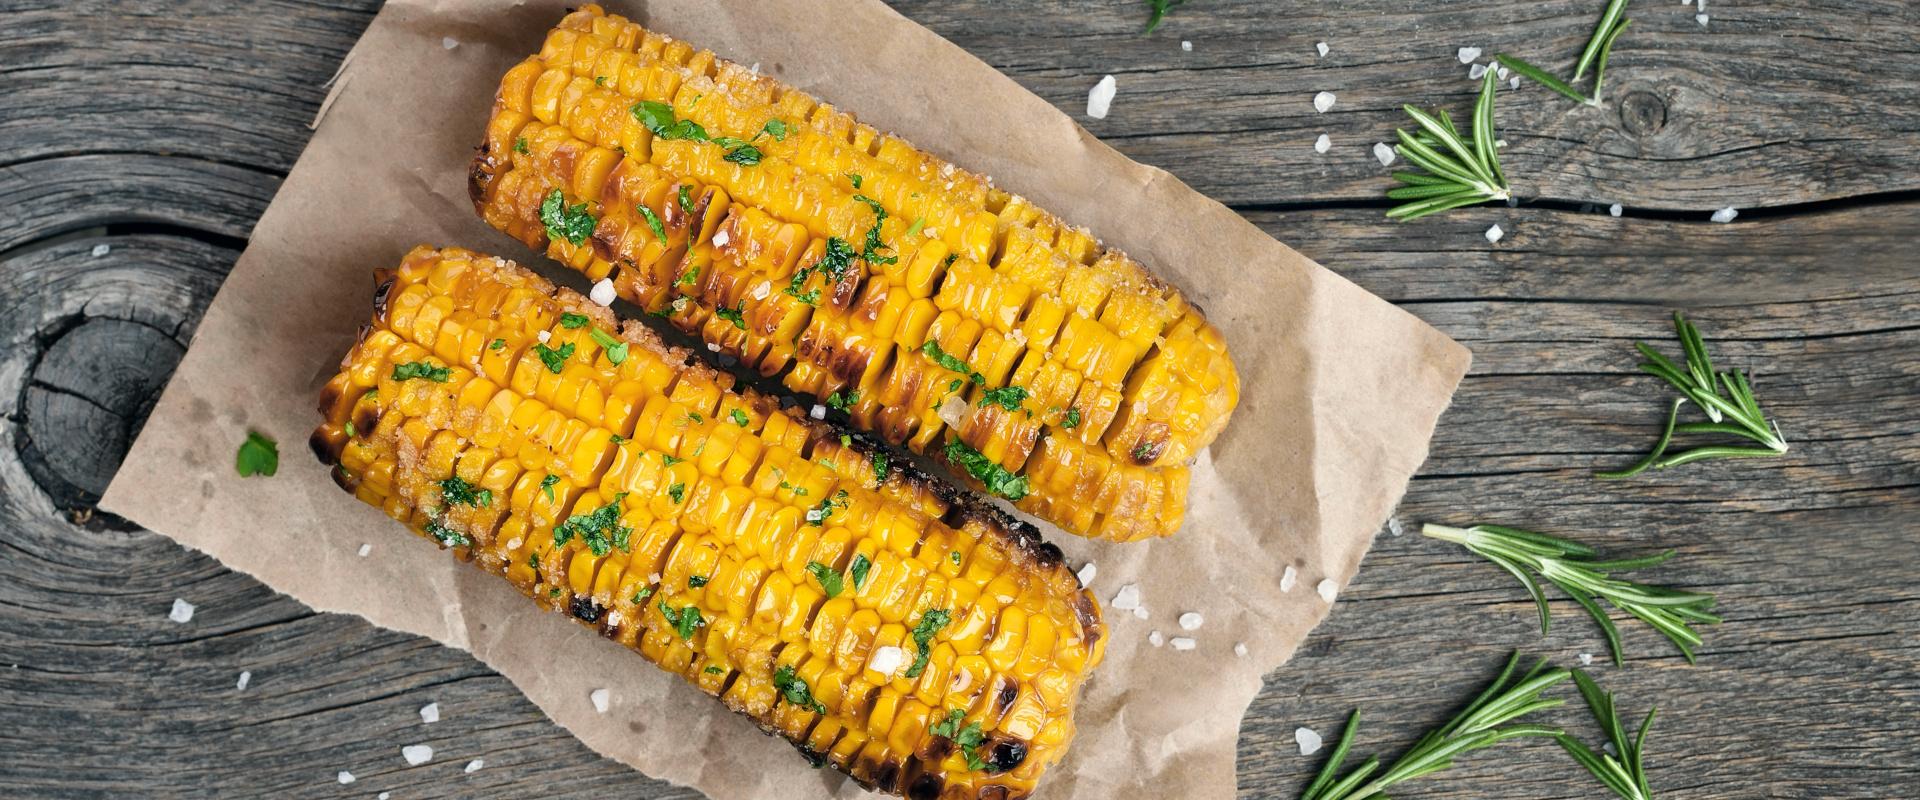 grillezett kukorica rozmaringgal cover